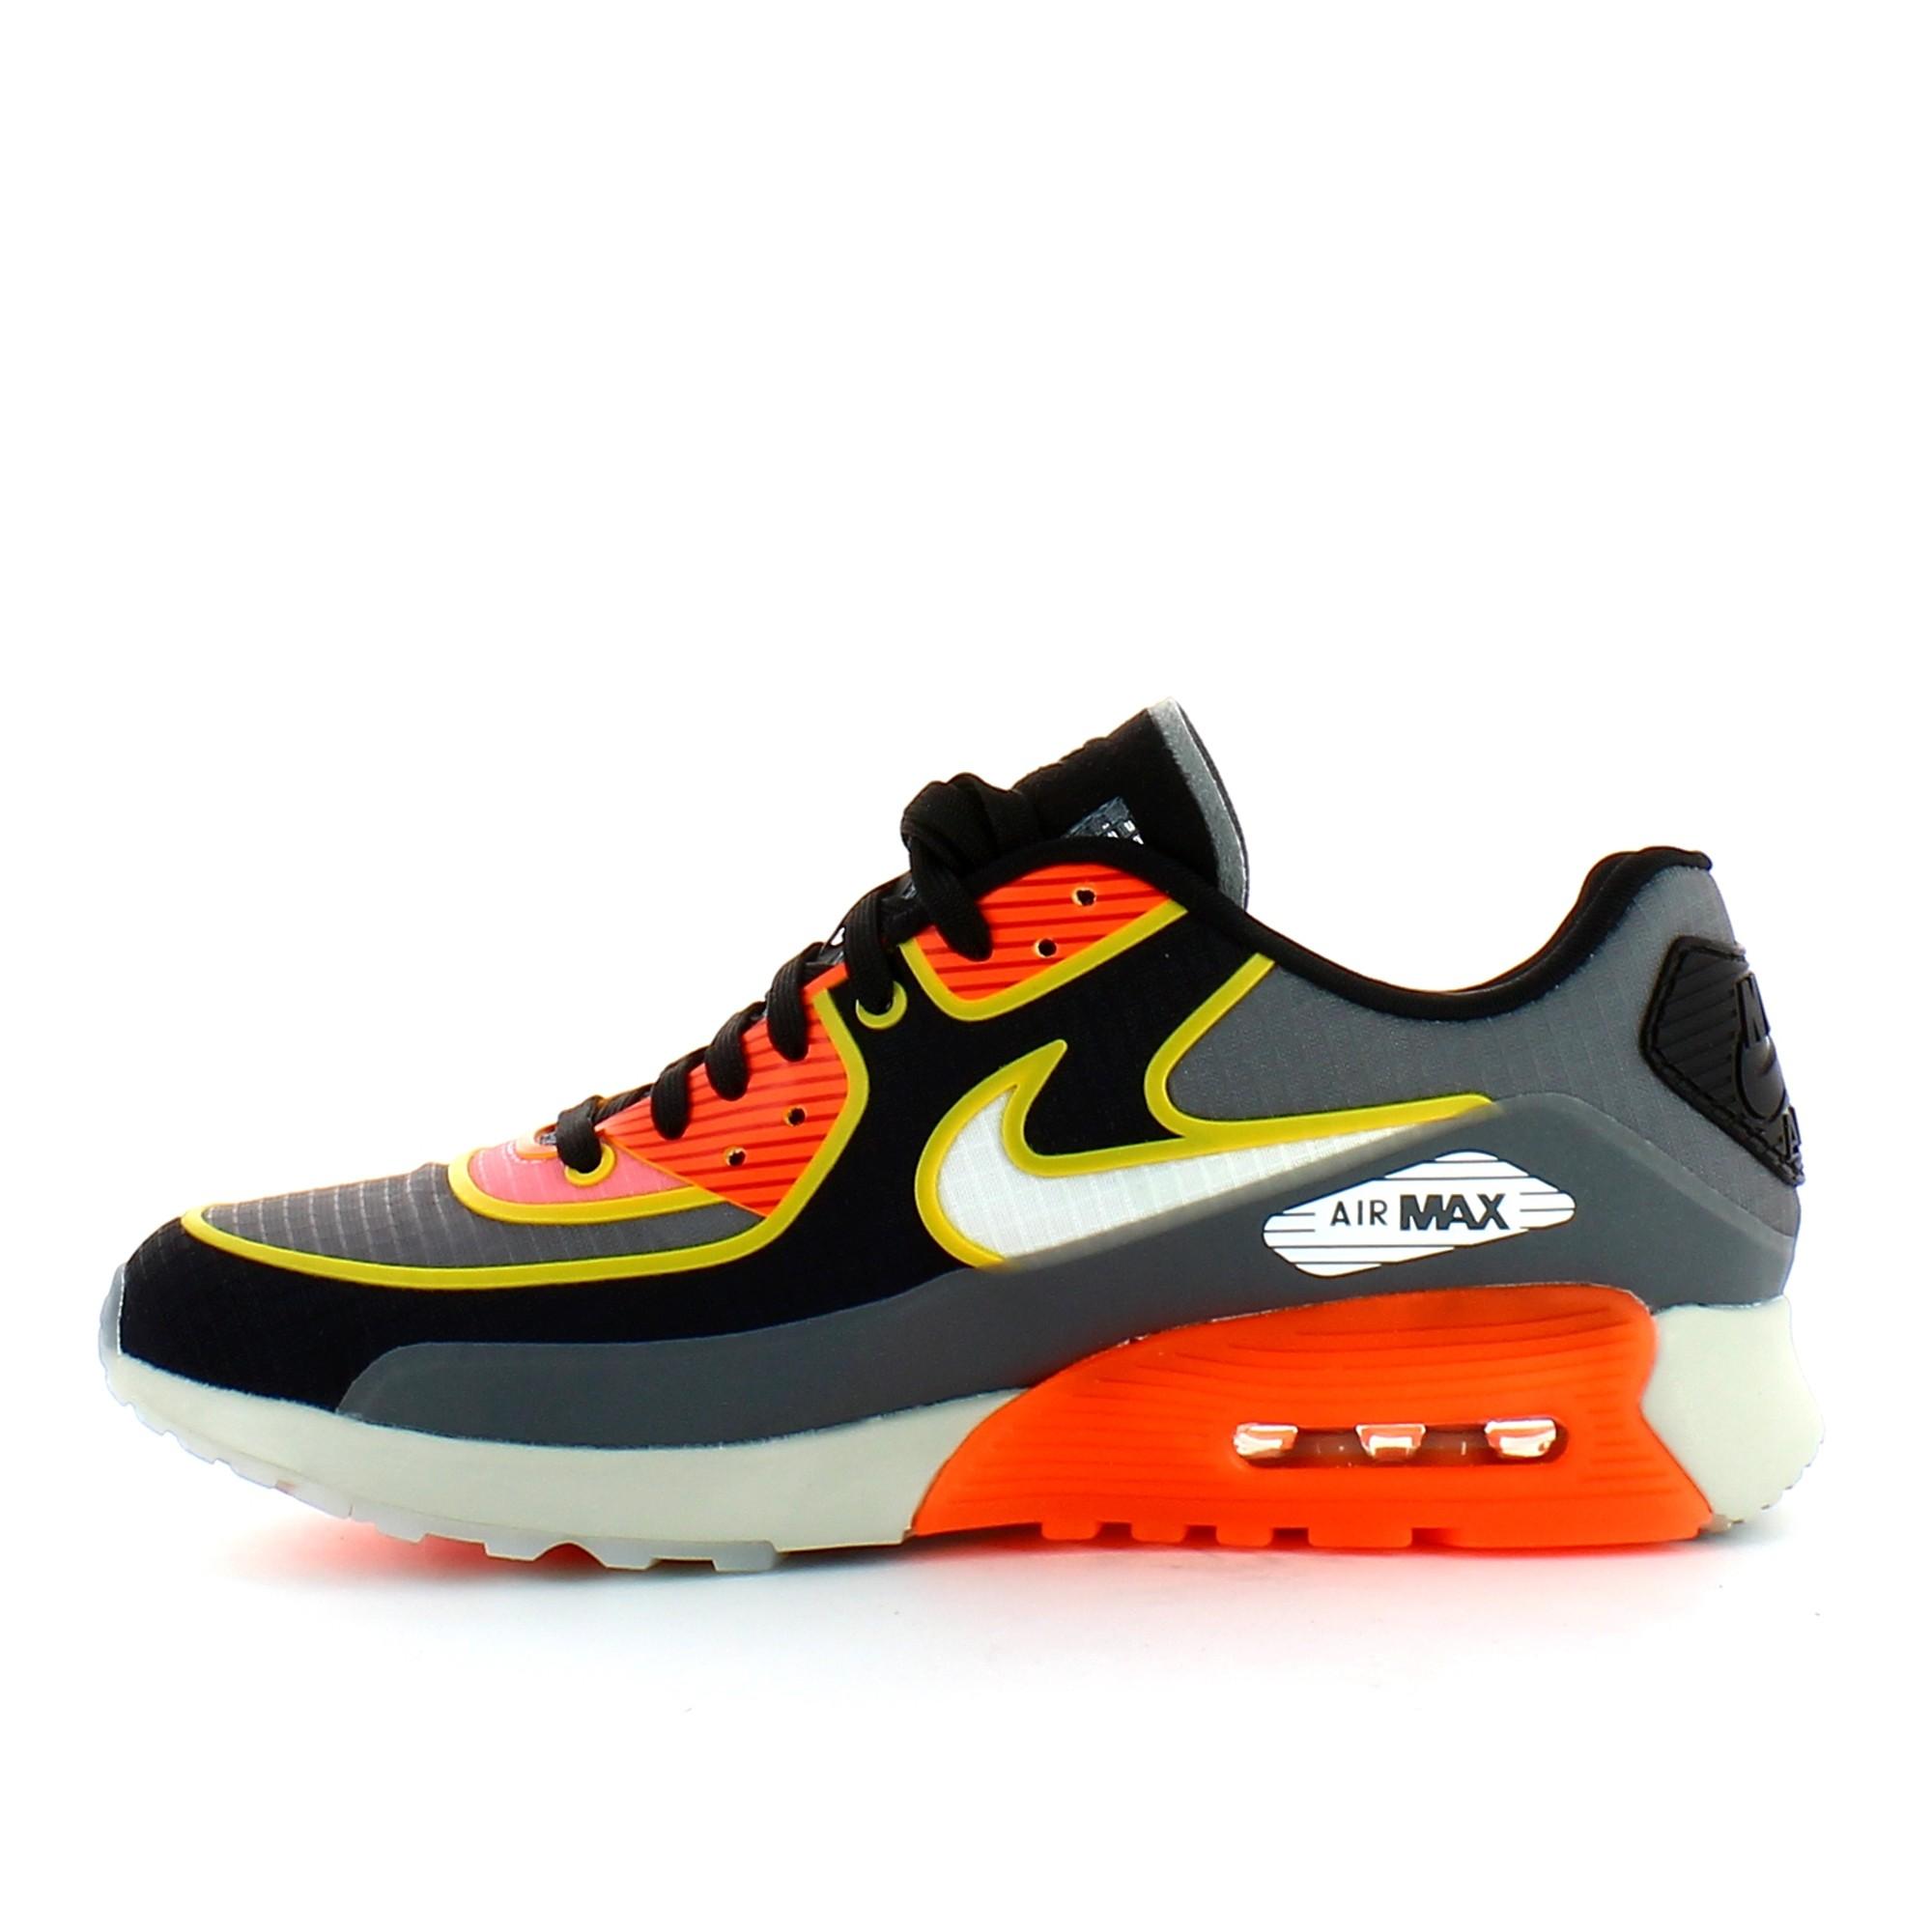 a2d481ecae28 ... sale zapatillas nike w air max 90 ultra 2.0 si gris naranja mujer  deportes moya a01fd